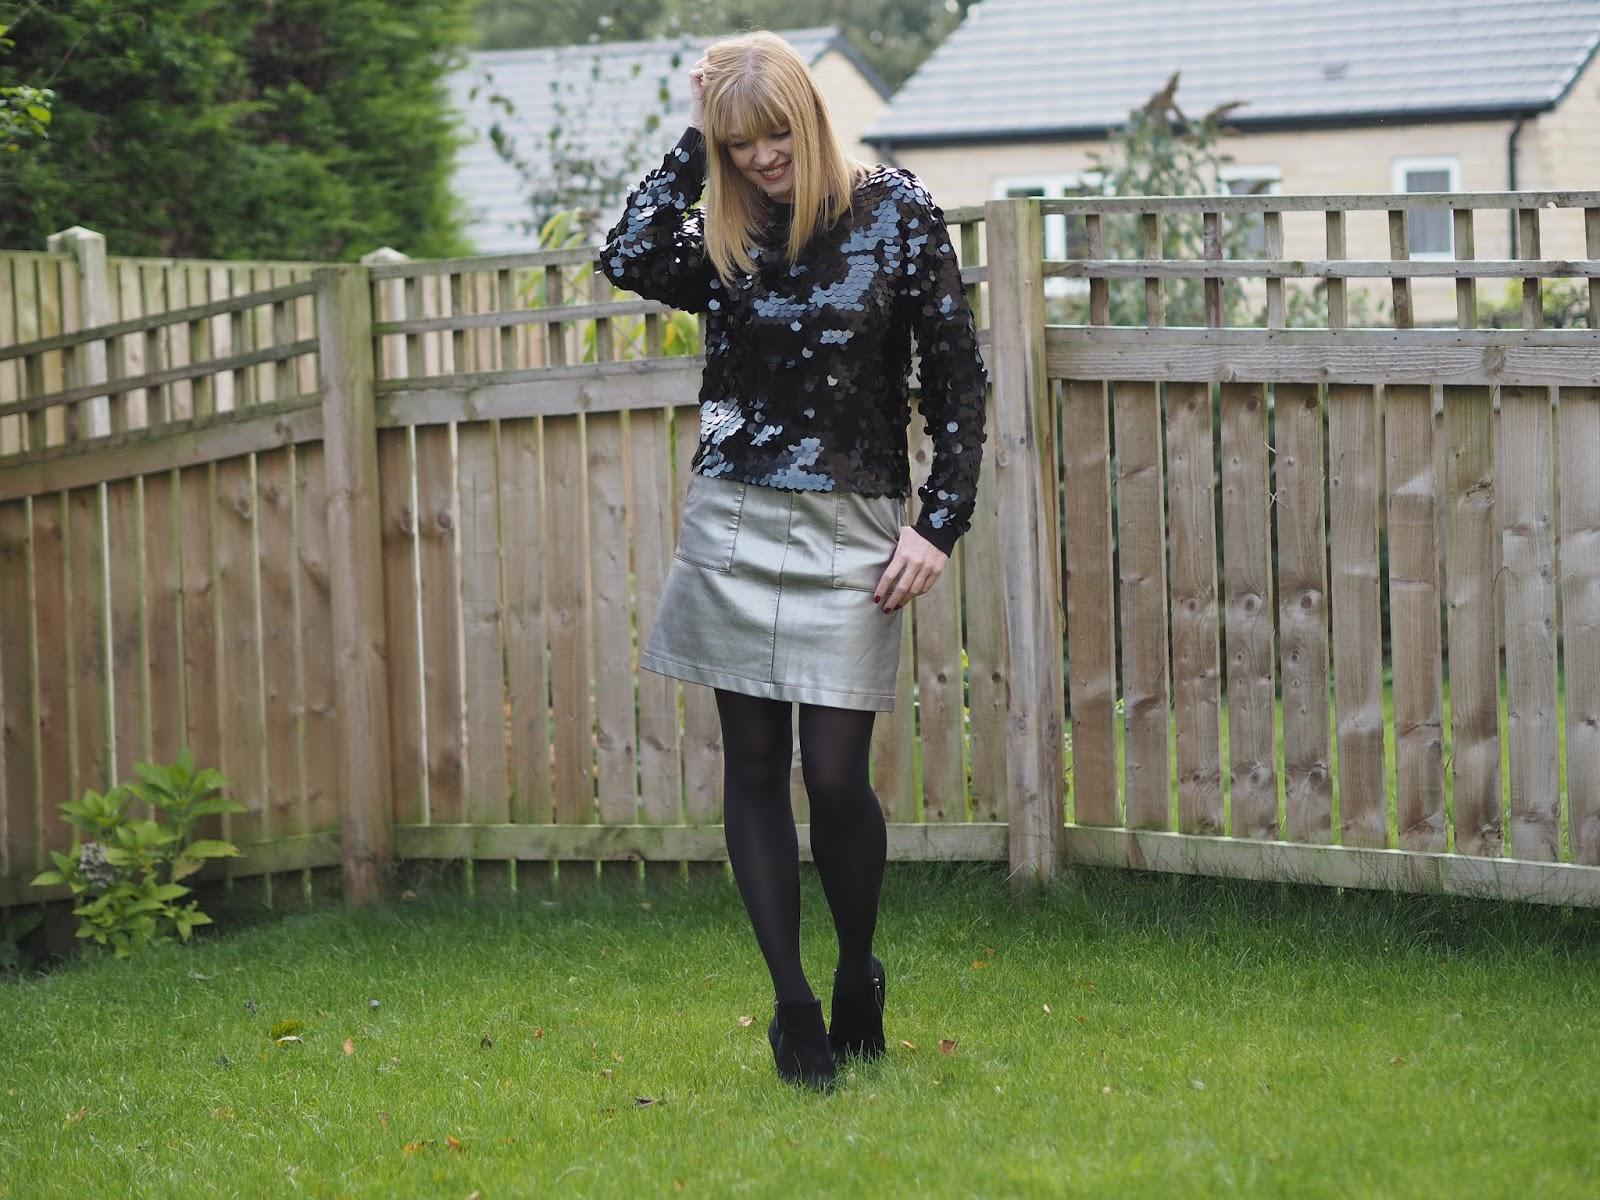 Black Pailette Sequin Sweater with Metallic Leather-Look Mini Skirt